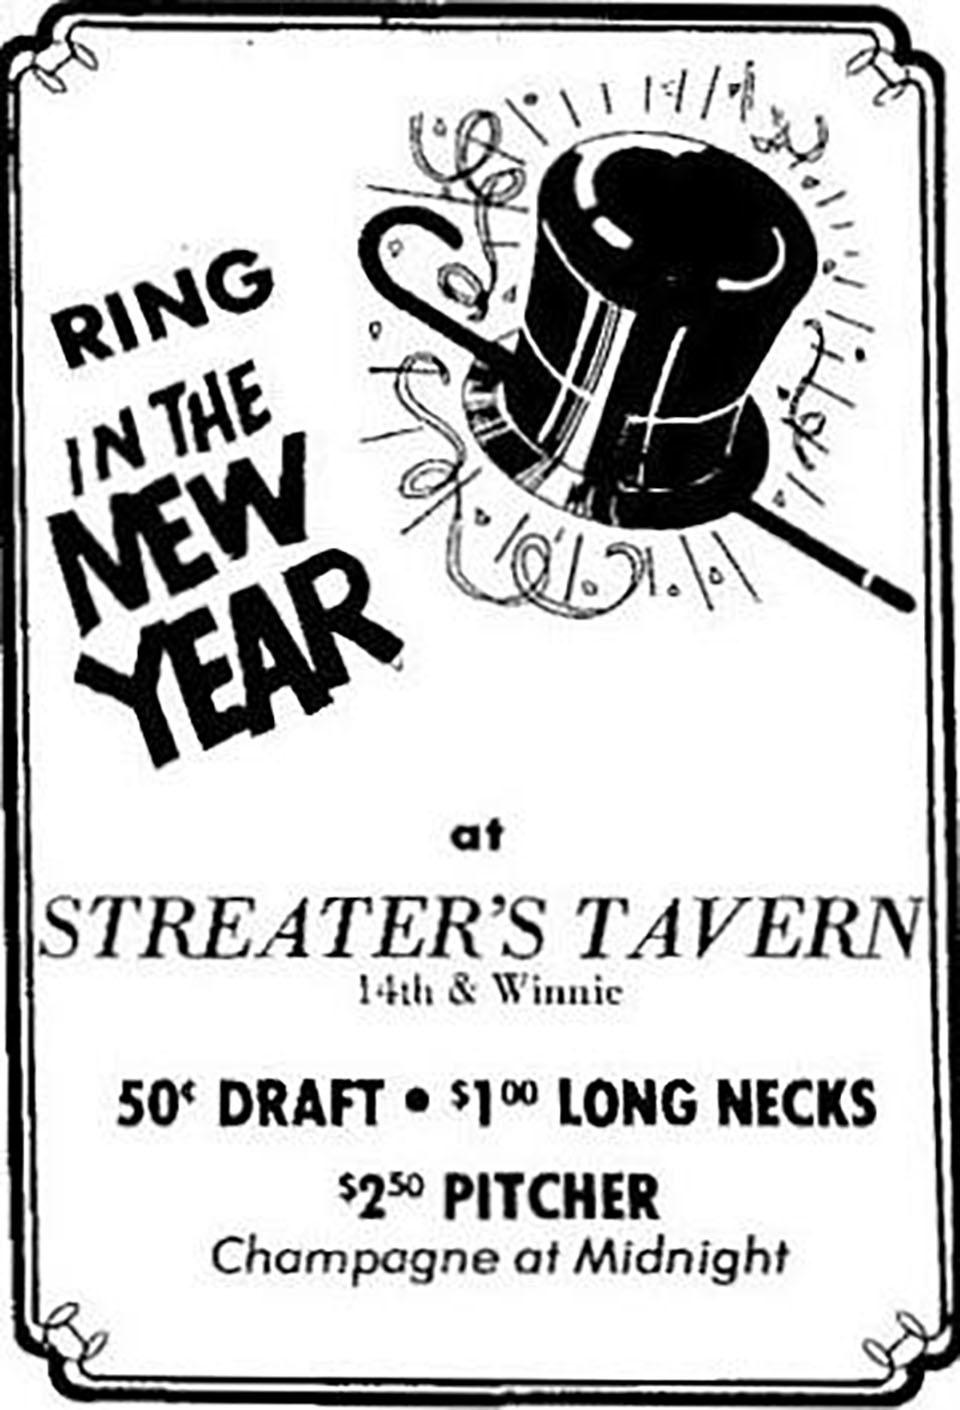 Streater's Tavern Ad